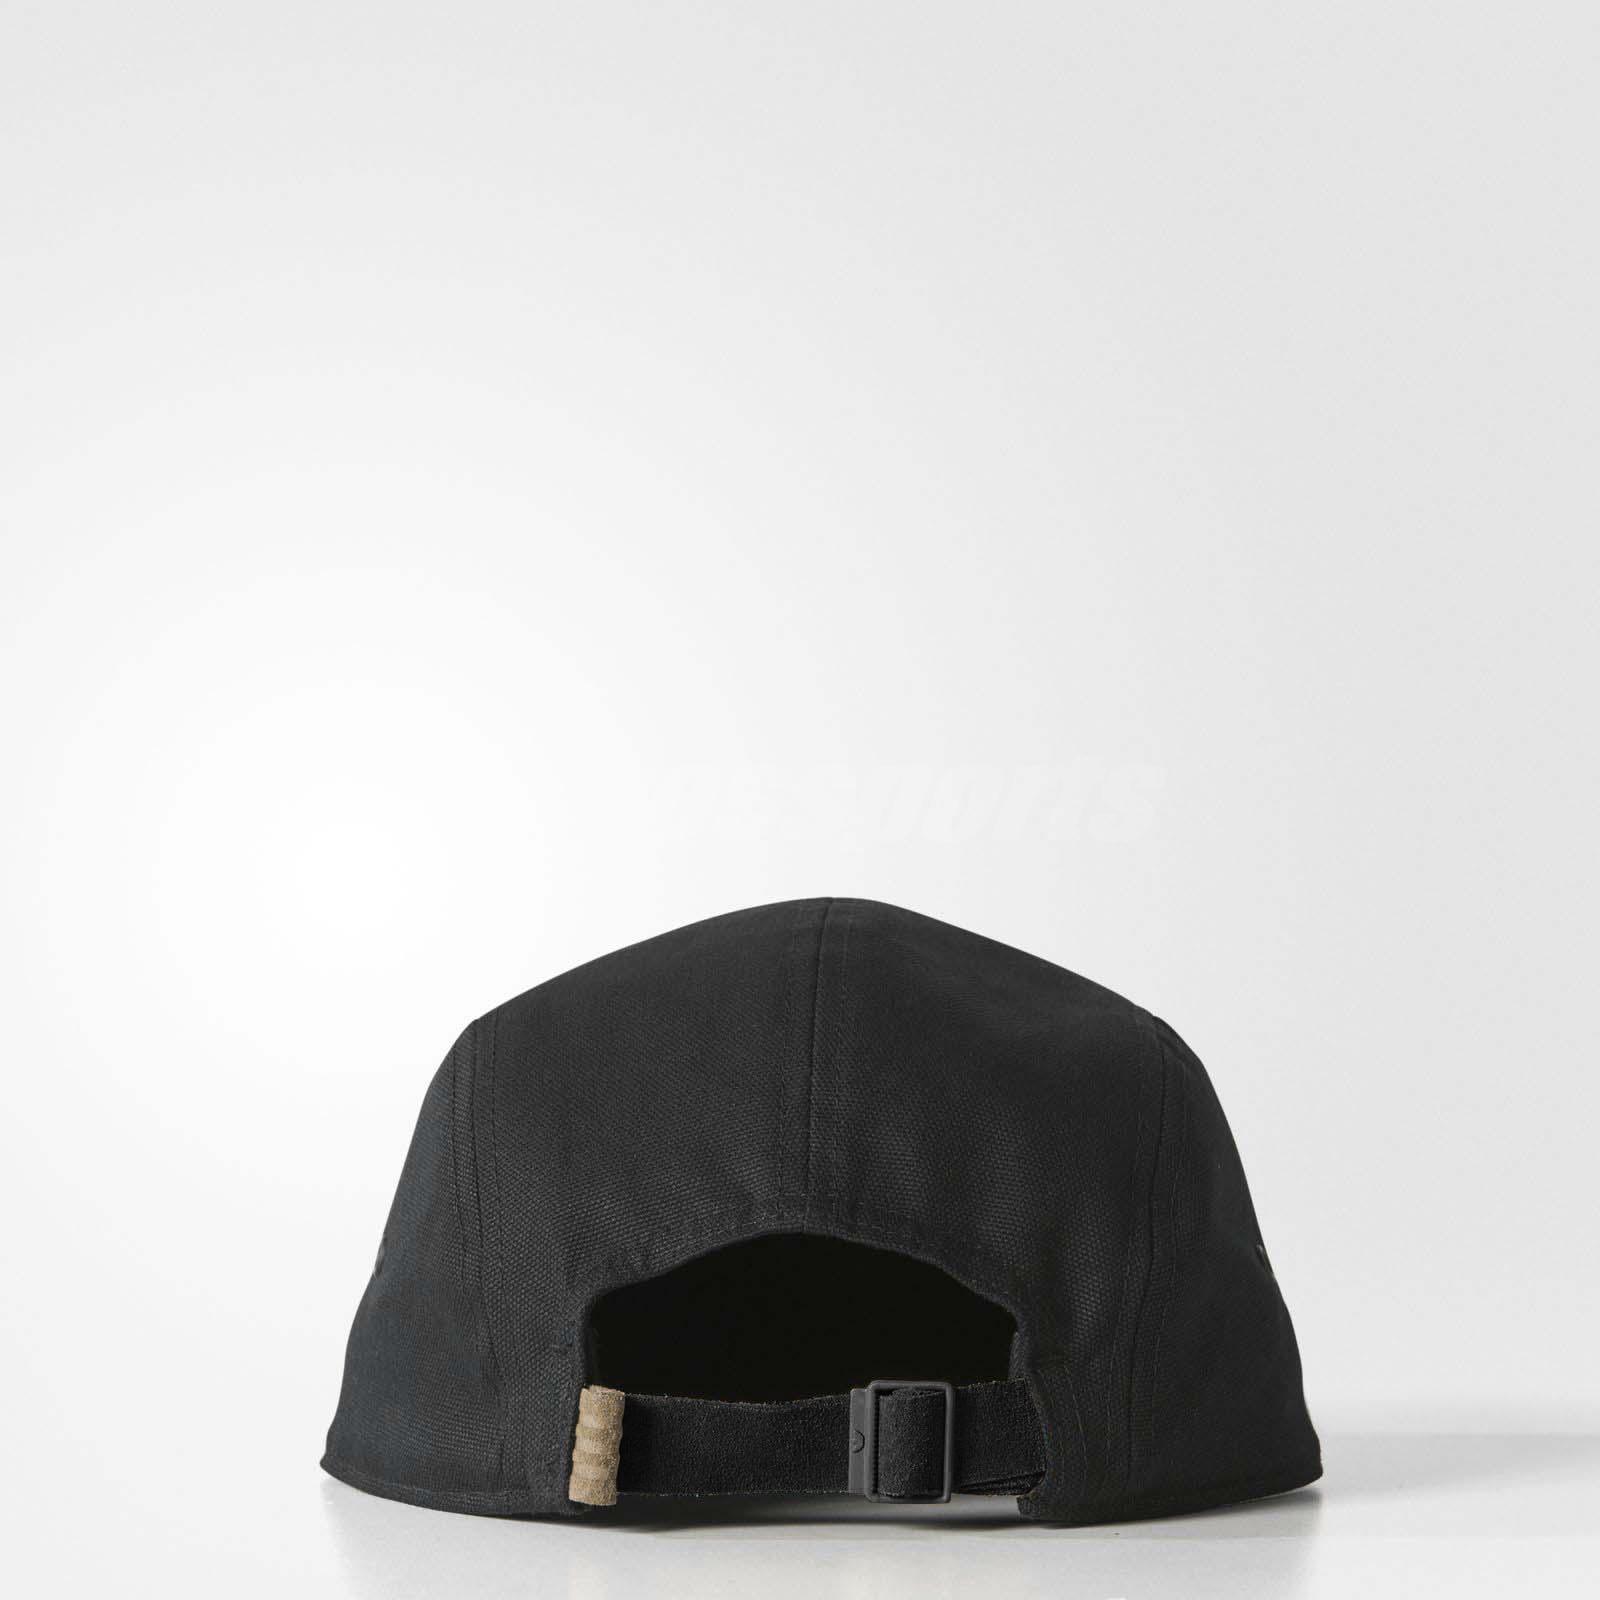 7ed3fc6b336 adidas Unisex Originals NMD Cap Baseball Sports Hat Trefoil Running ...